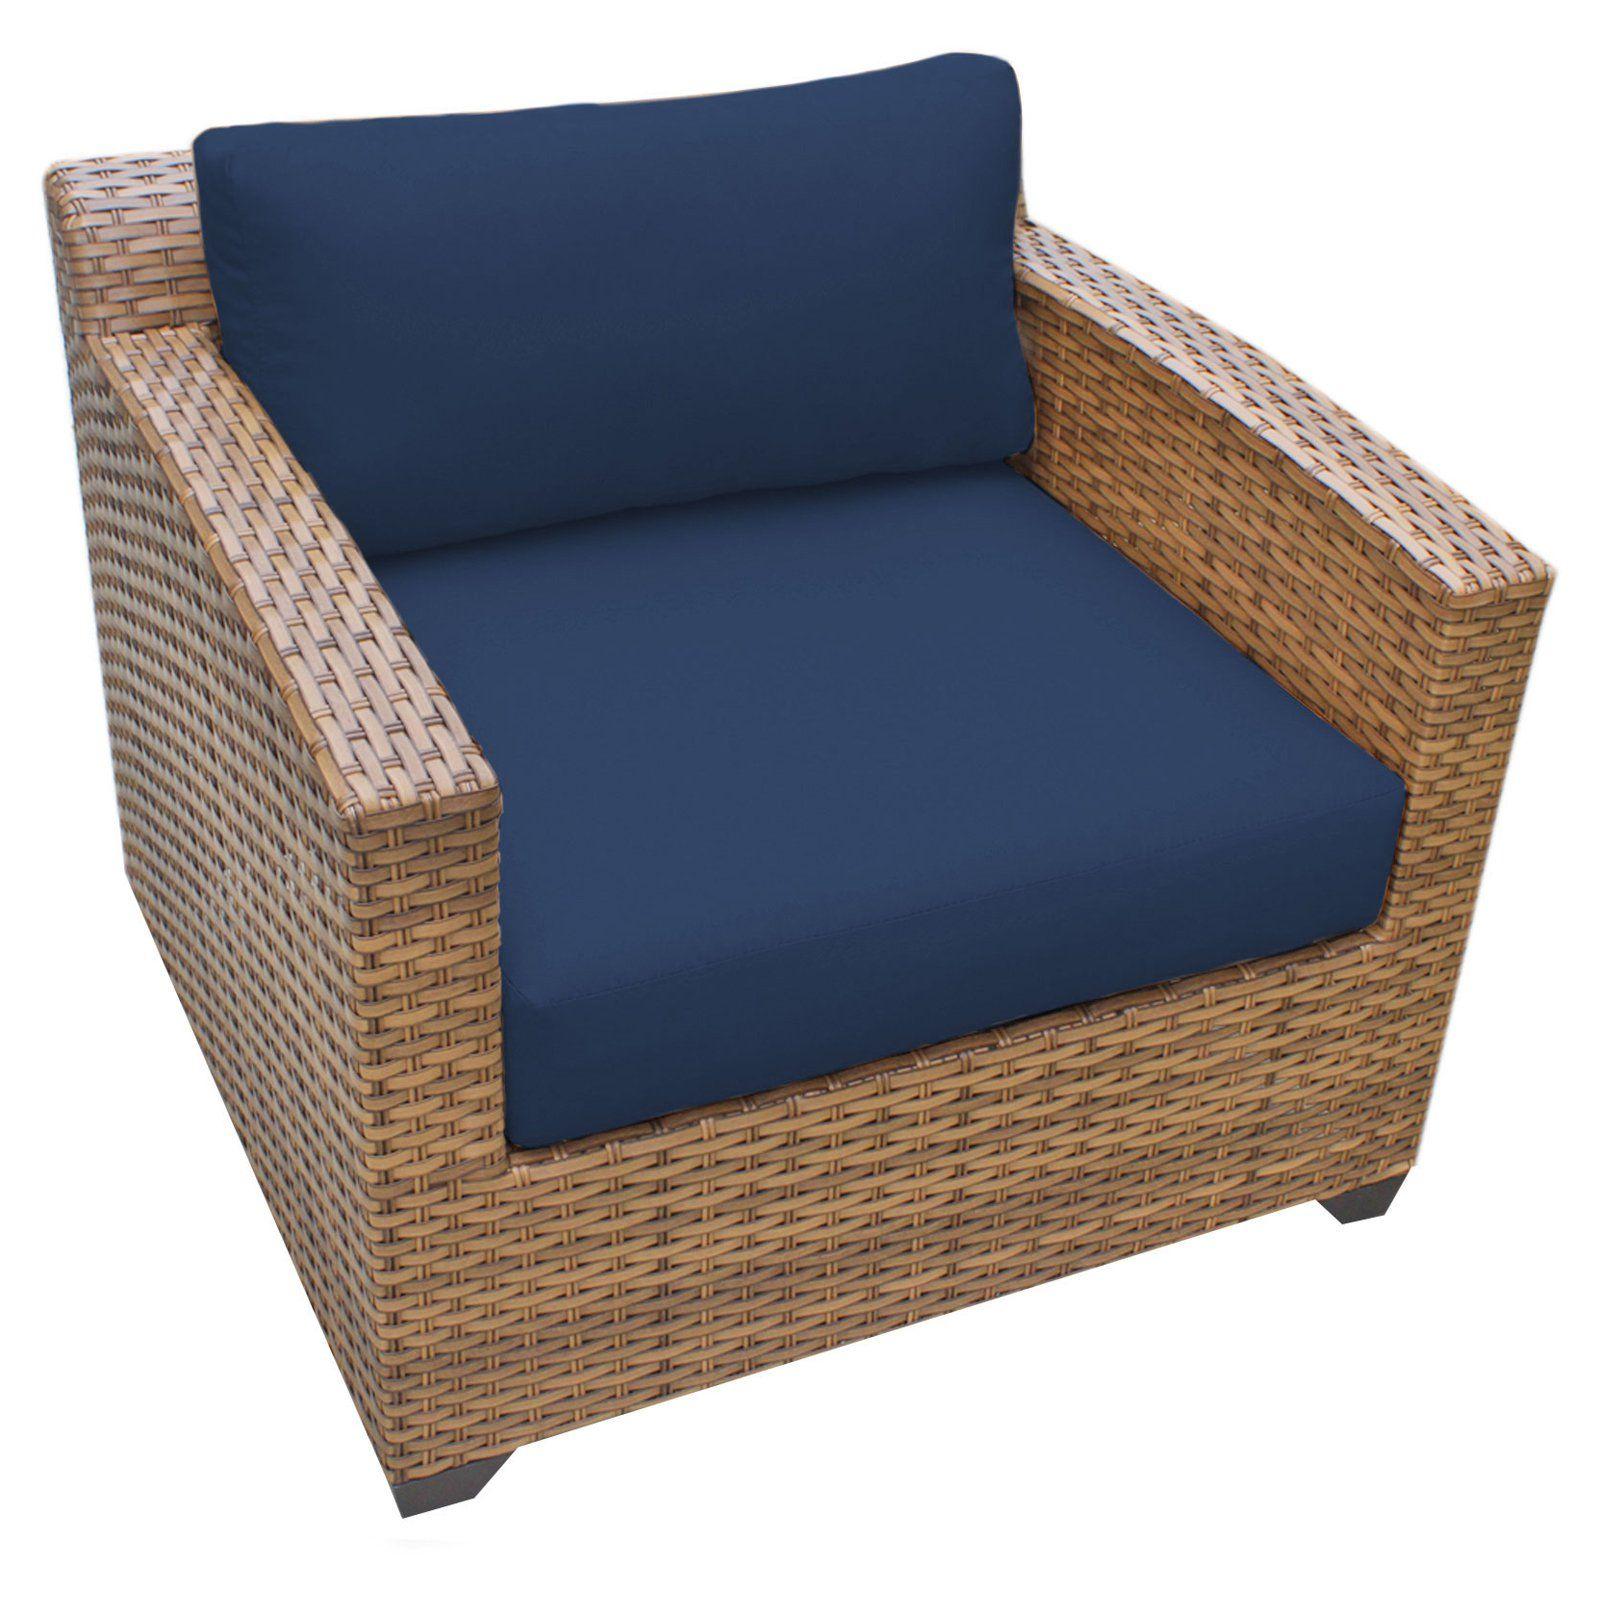 Tk classics laguna wicker outdoor club chair set of cushion